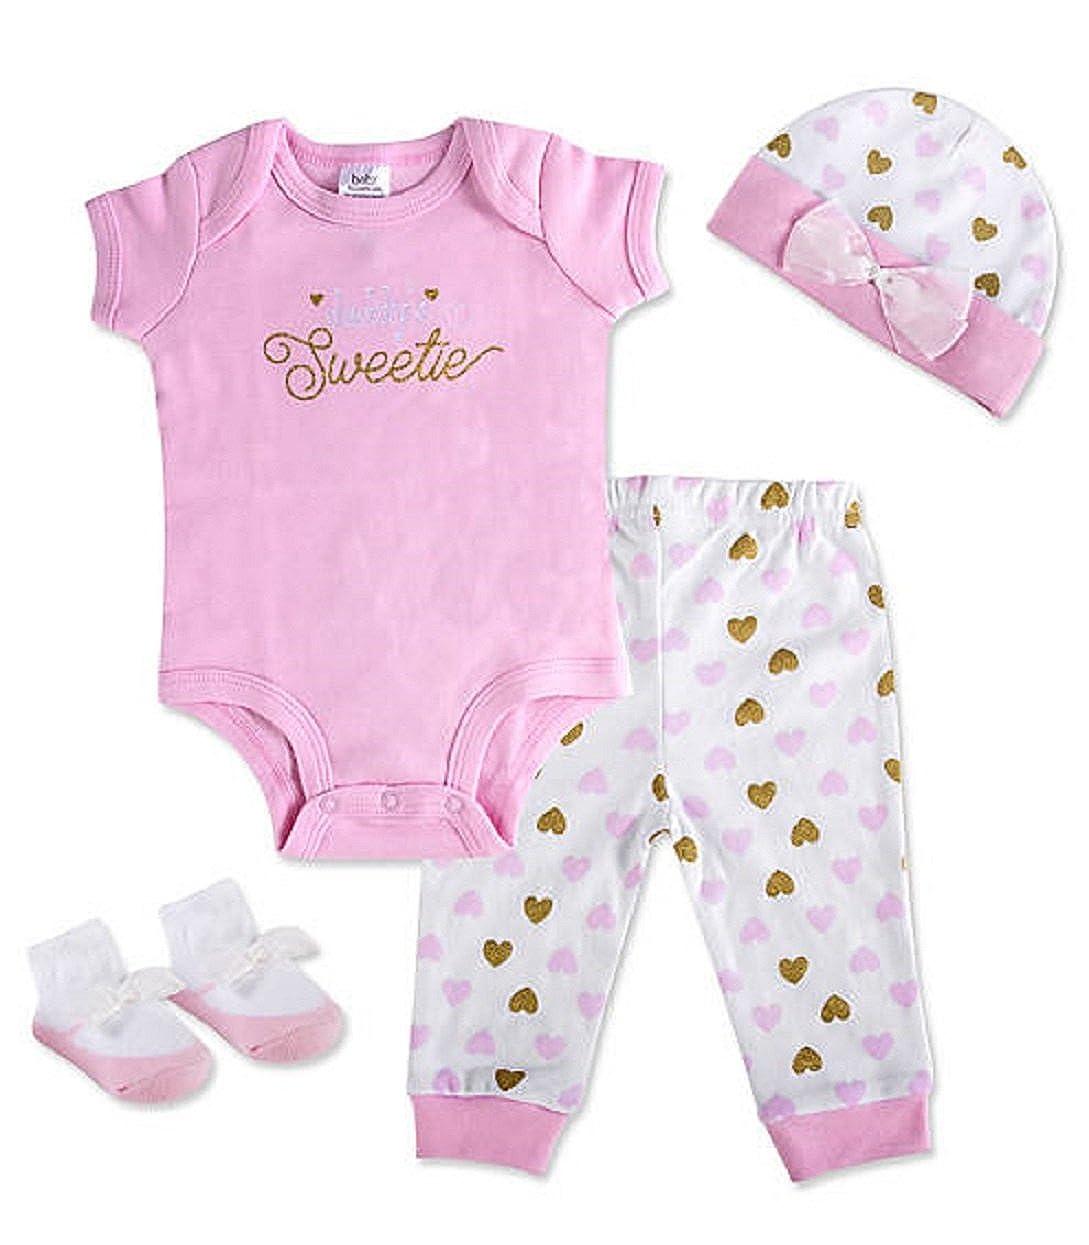 Baby Essentials Girl Gift Set